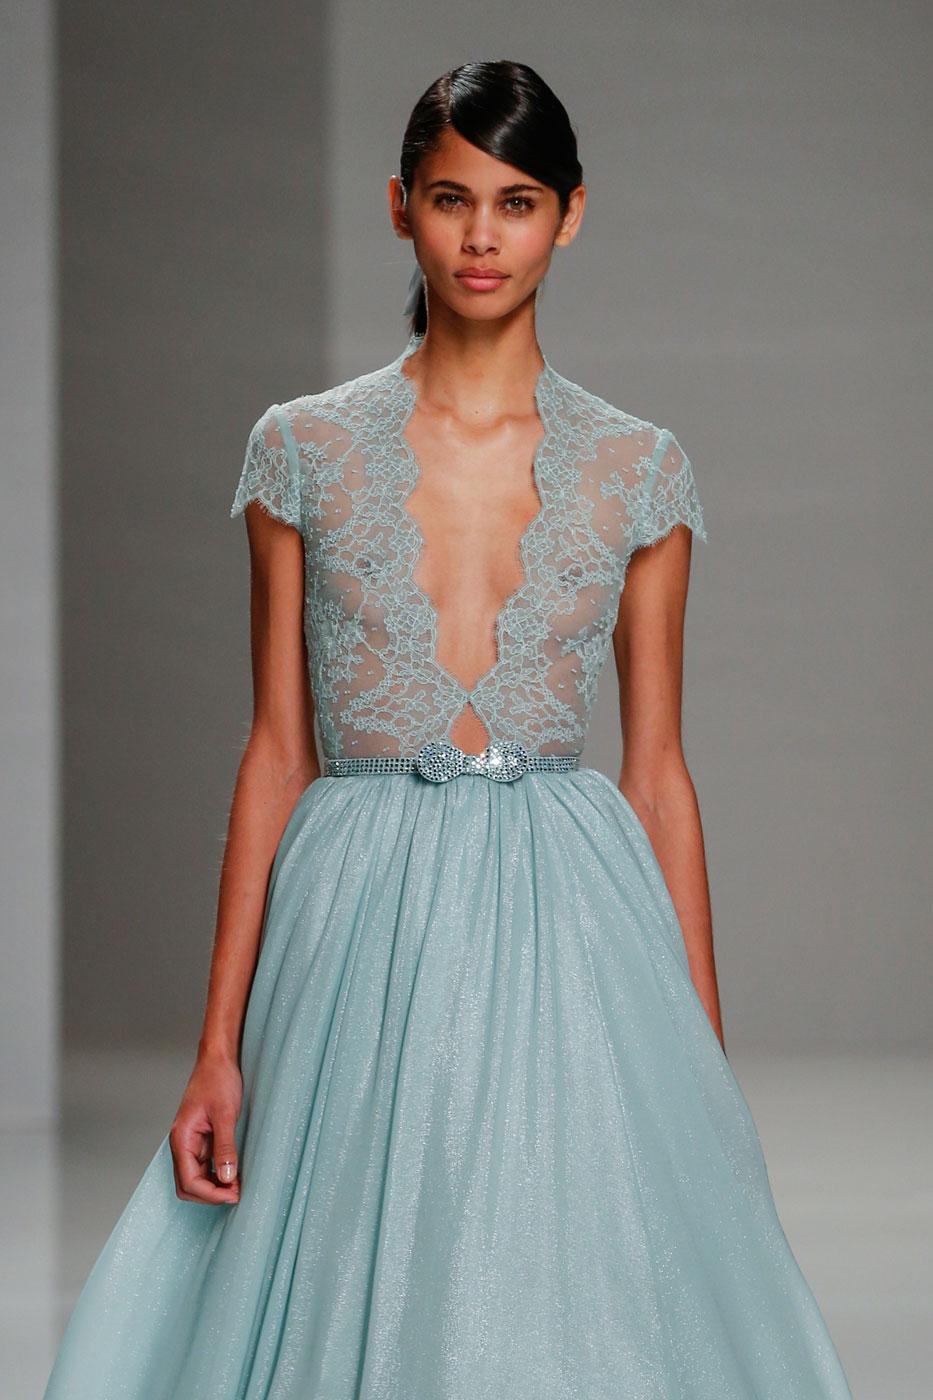 Georges-Hobeika-fashion-runway-show-haute-couture-paris-spring-2015-the-impression-42